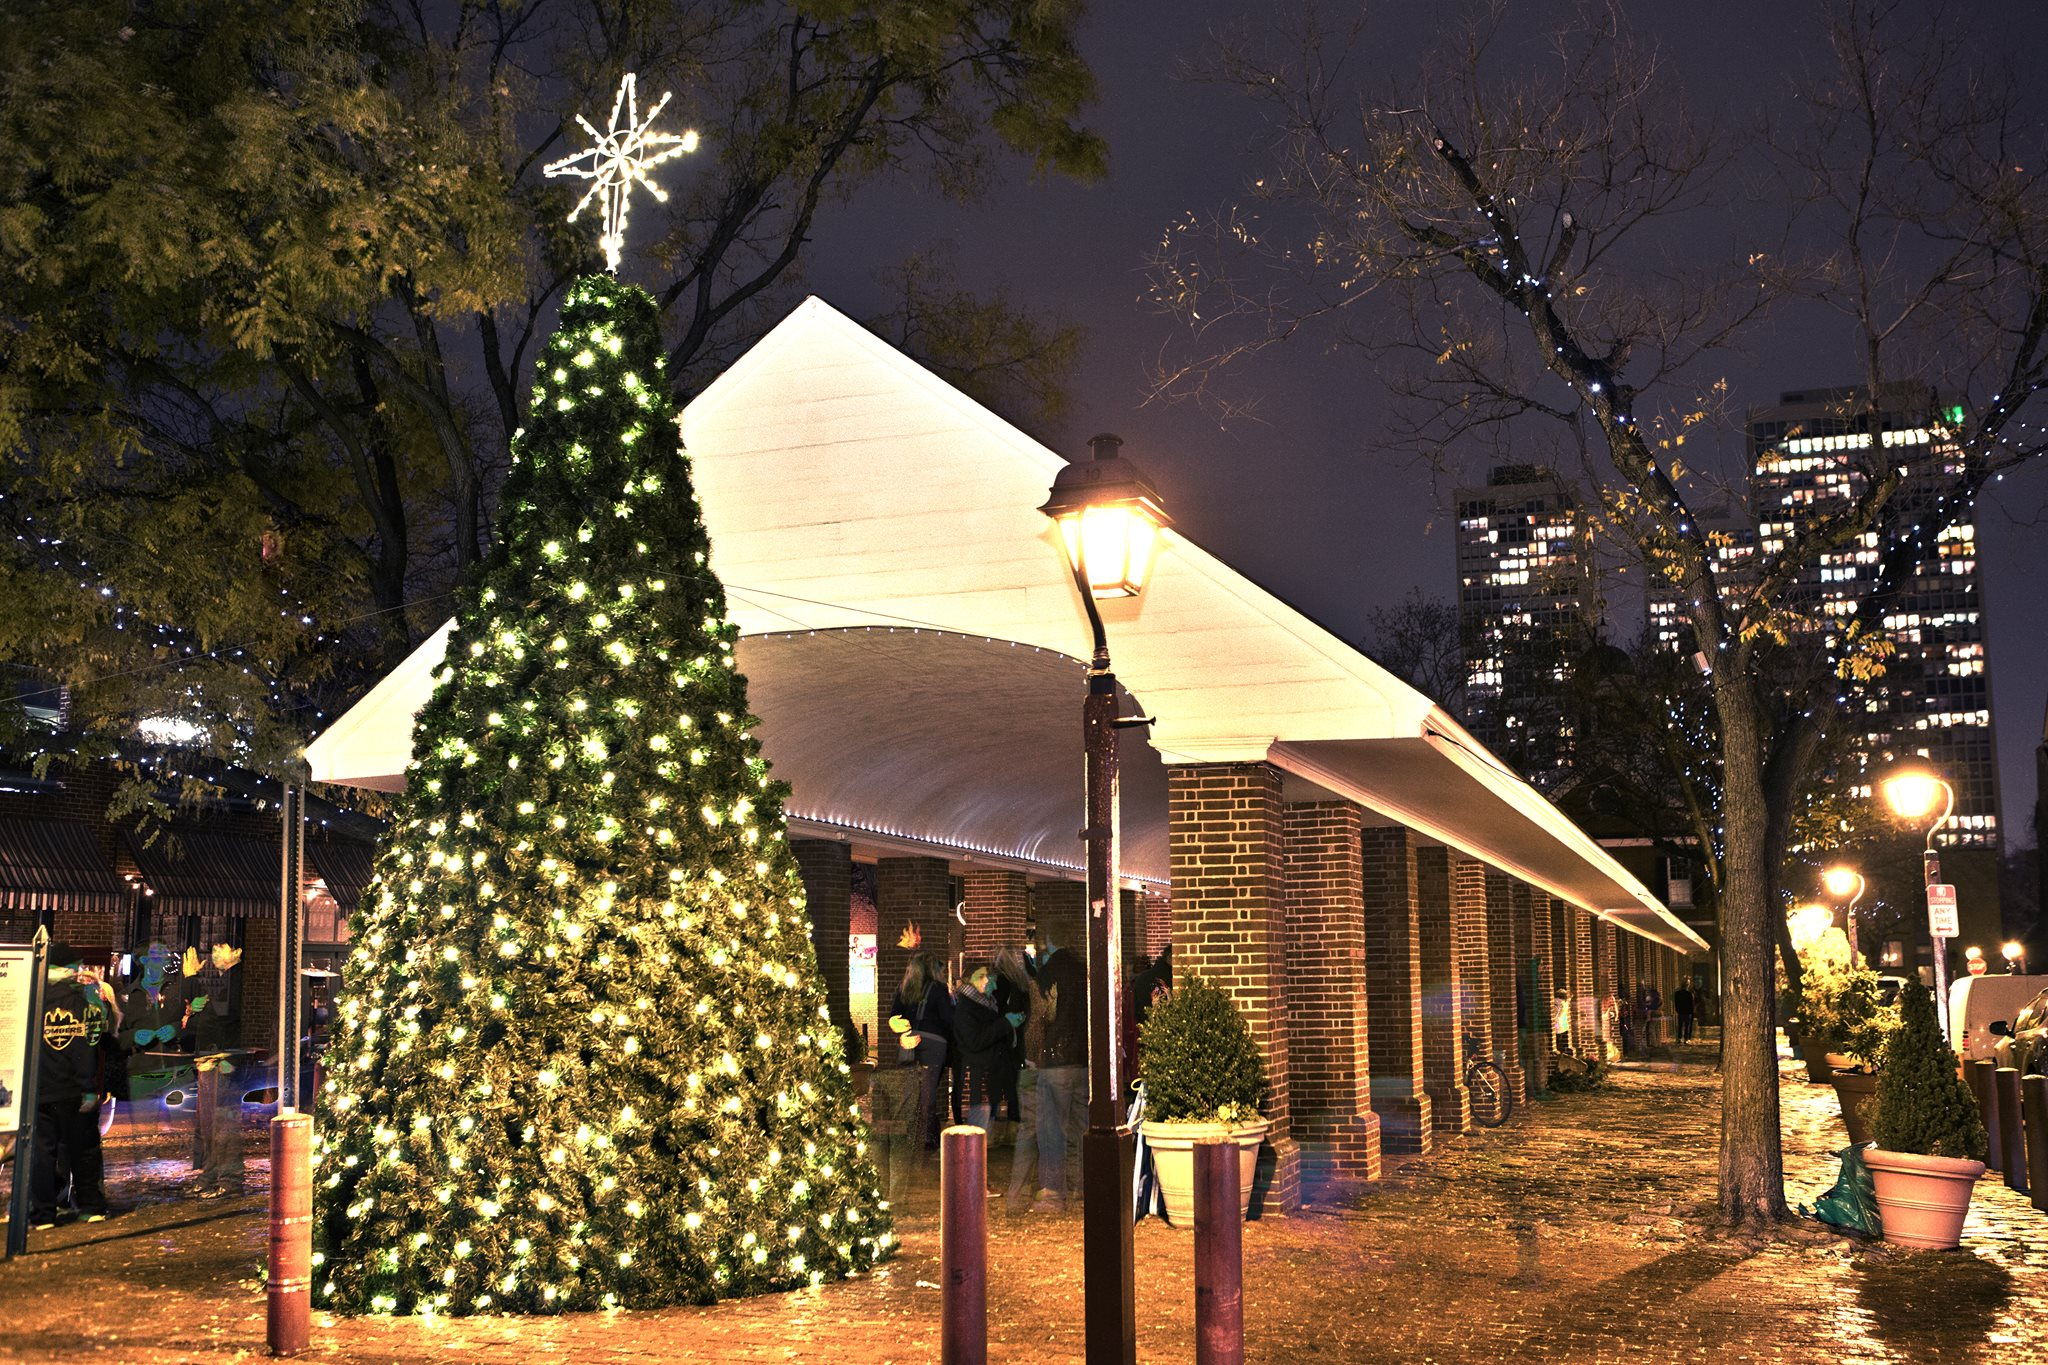 Christmas Tree Lighting, Philadelphia, City Hall, South Street, East Passyunk, Christmas Village, Love Park, Mt. Airy, Glen Foerd